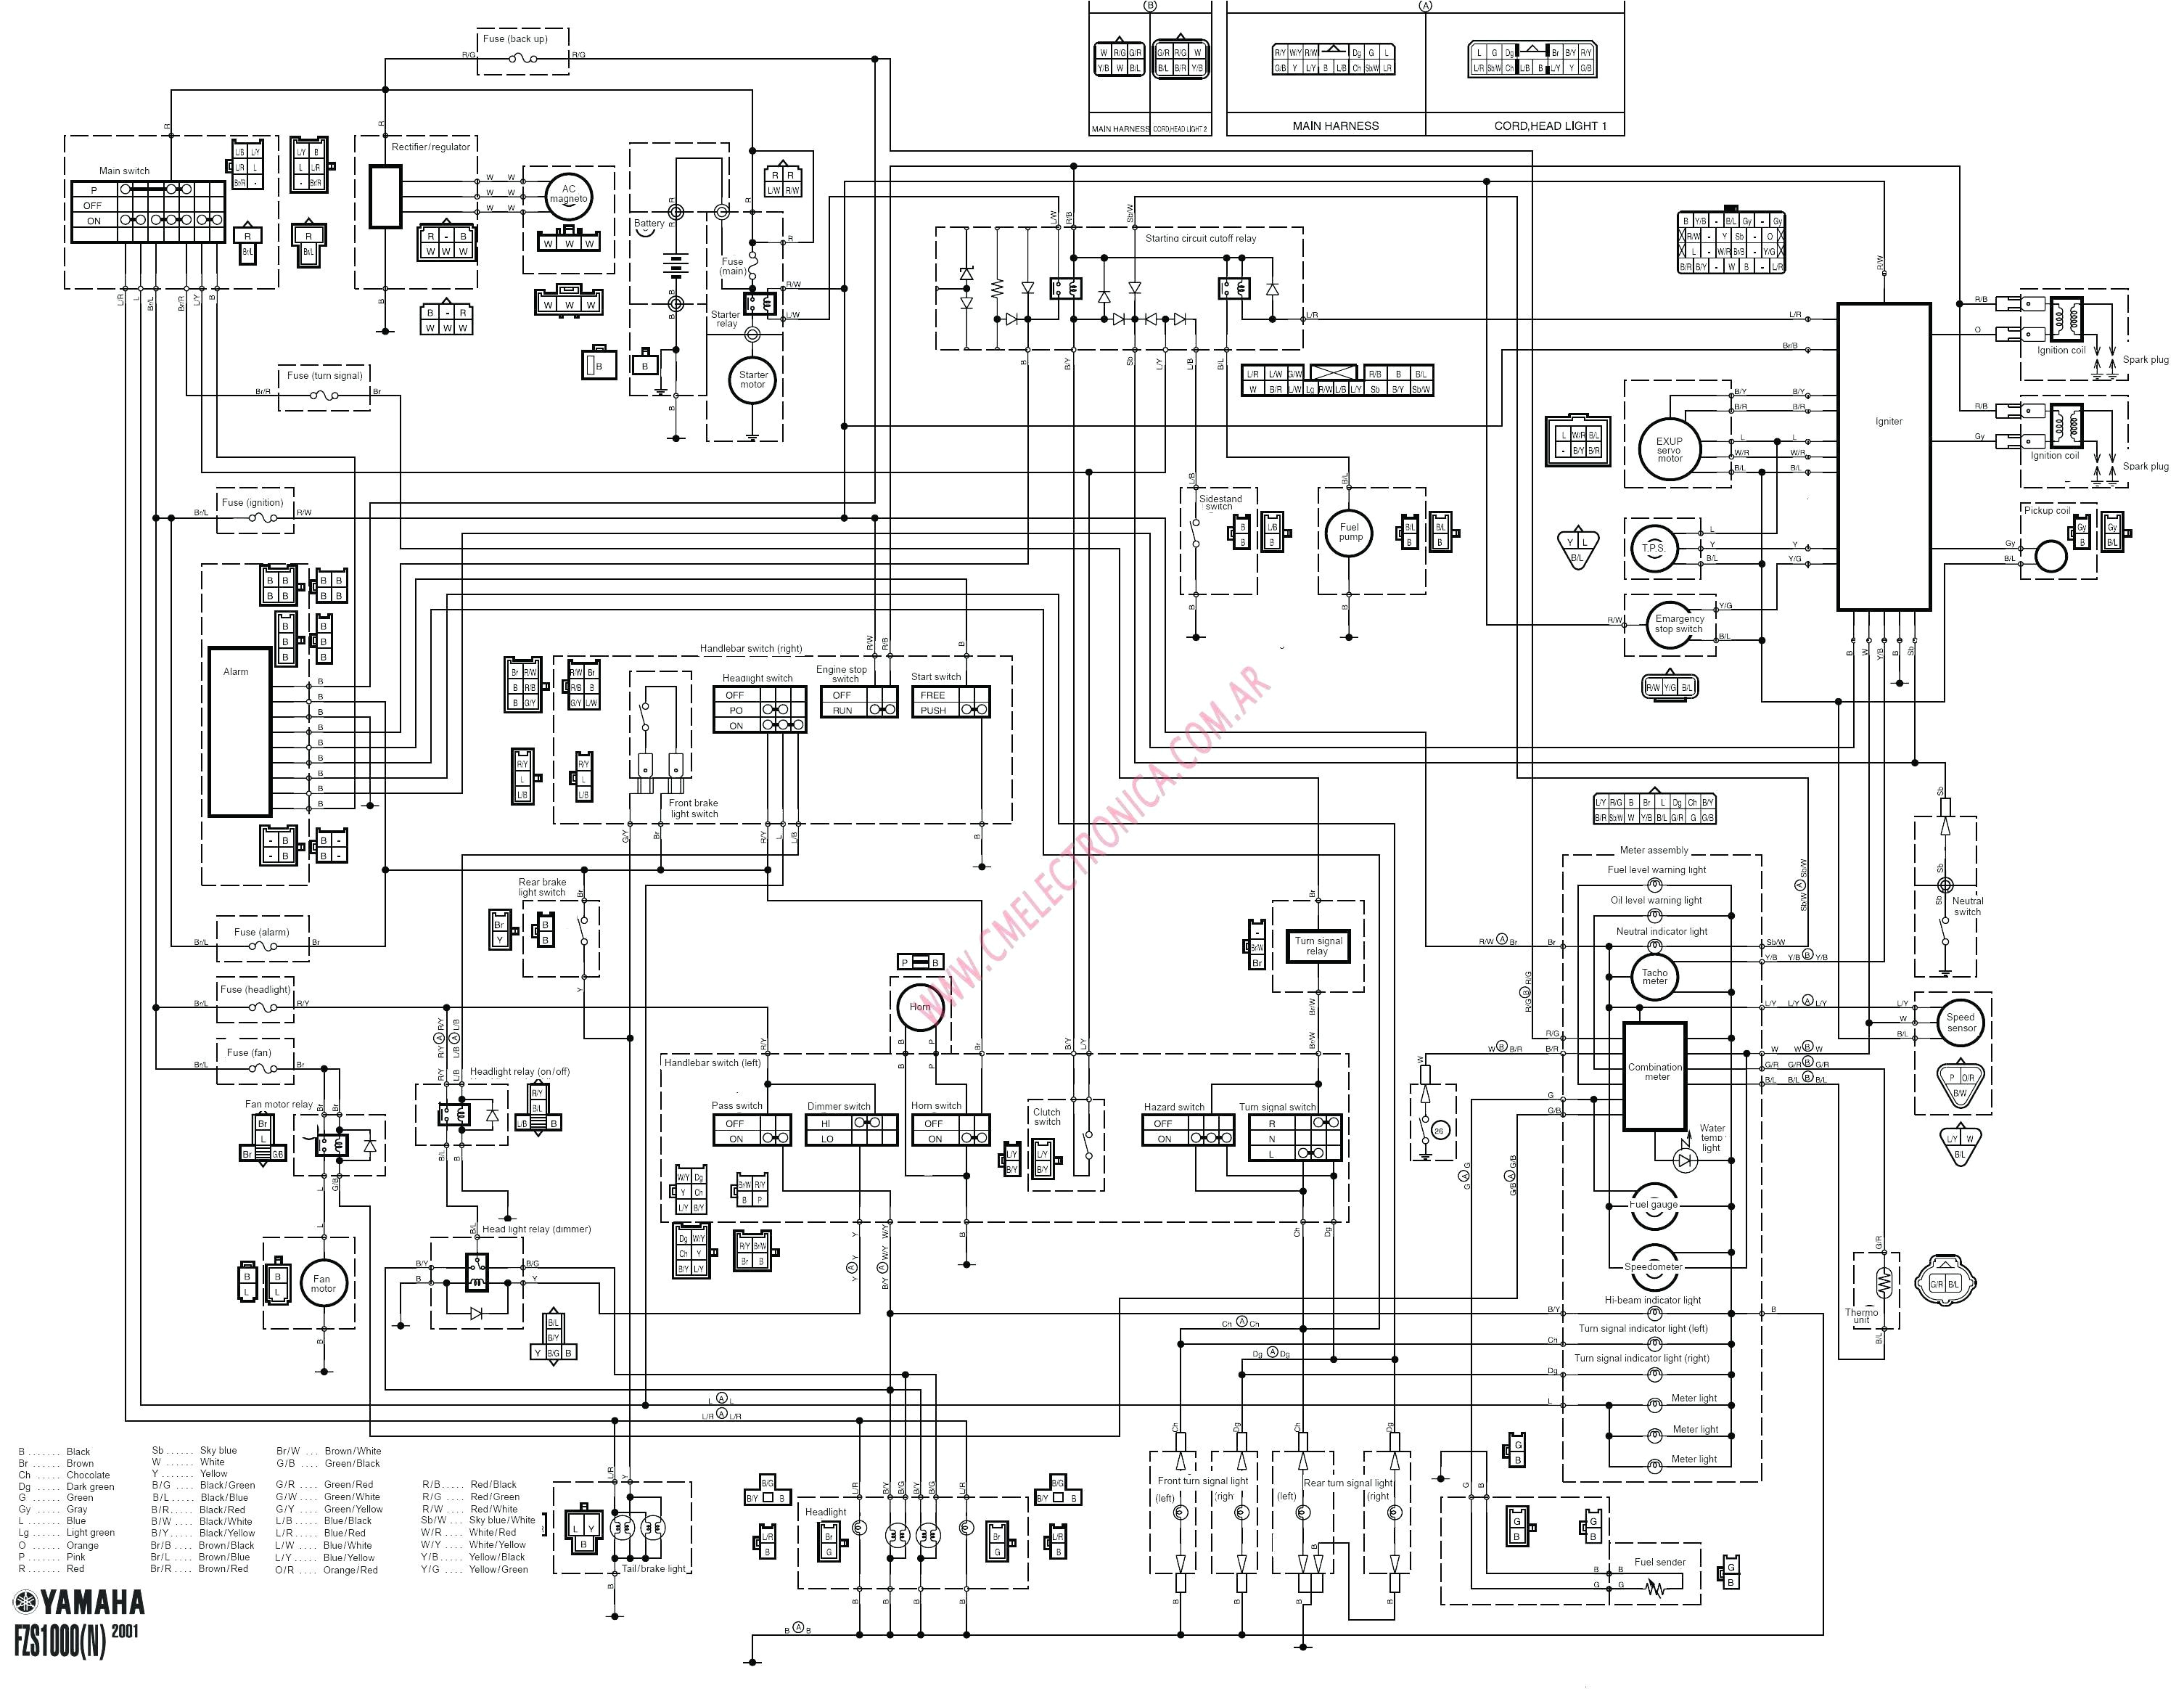 grasshopper 618 wiring diagram best of f350 pto diagram plete wiring diagrams